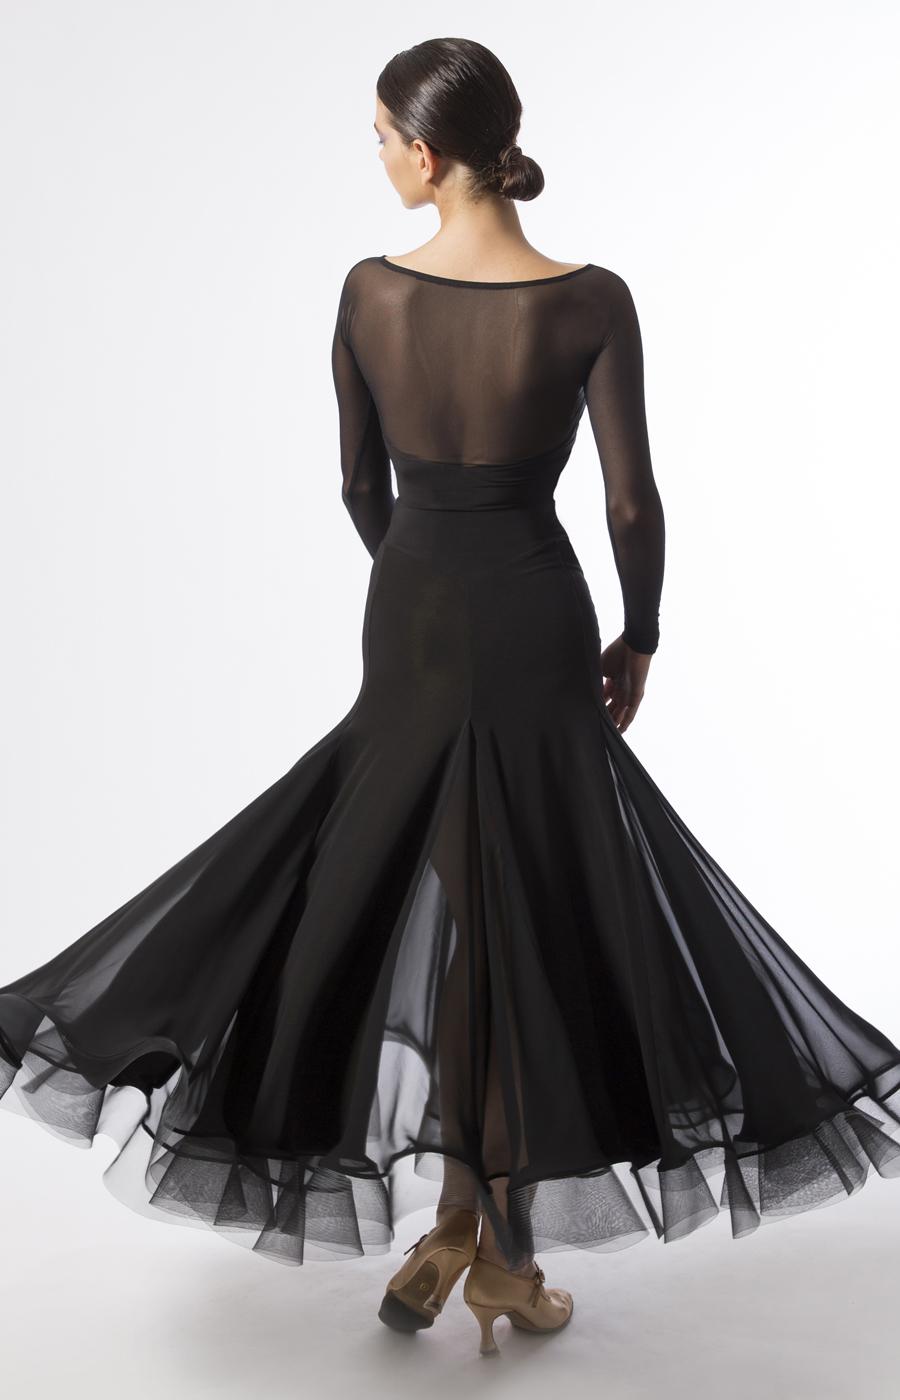 Ballroom skirt Donatella